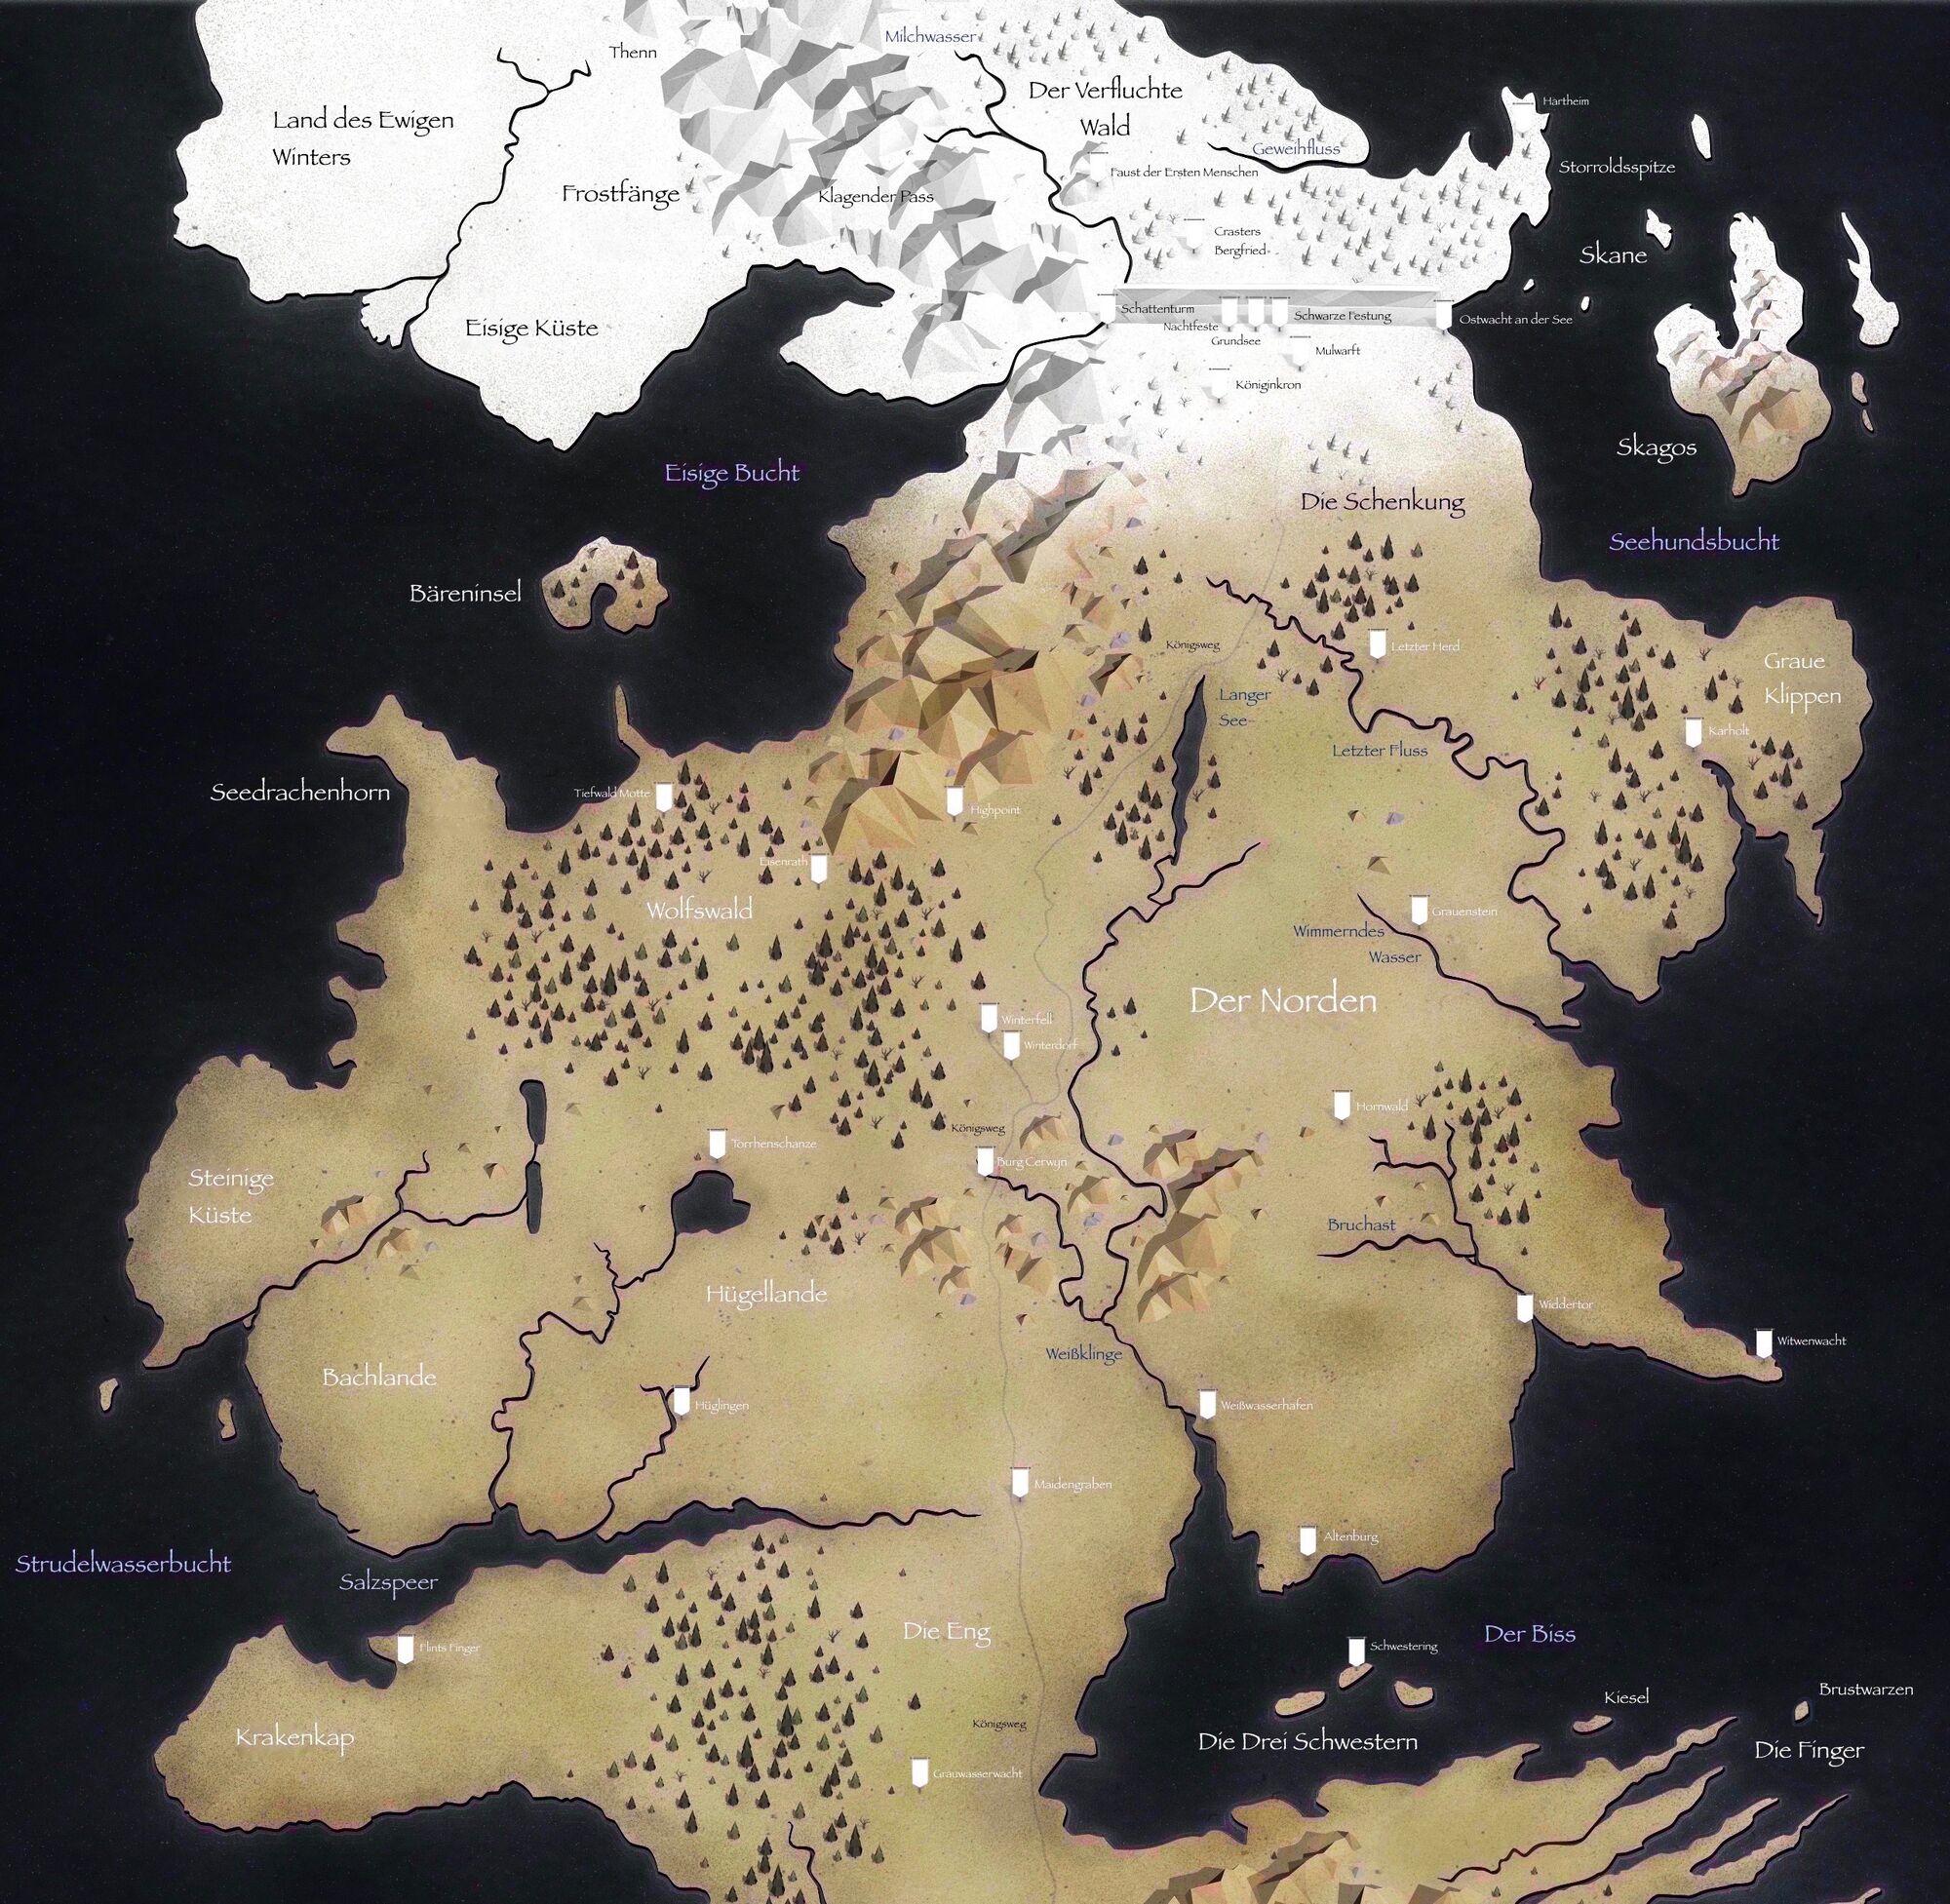 Sieben Königslande